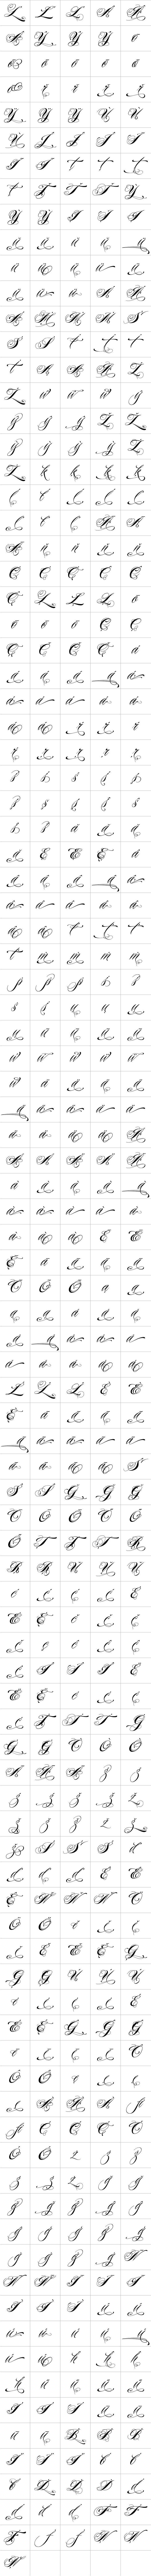 Piel Script